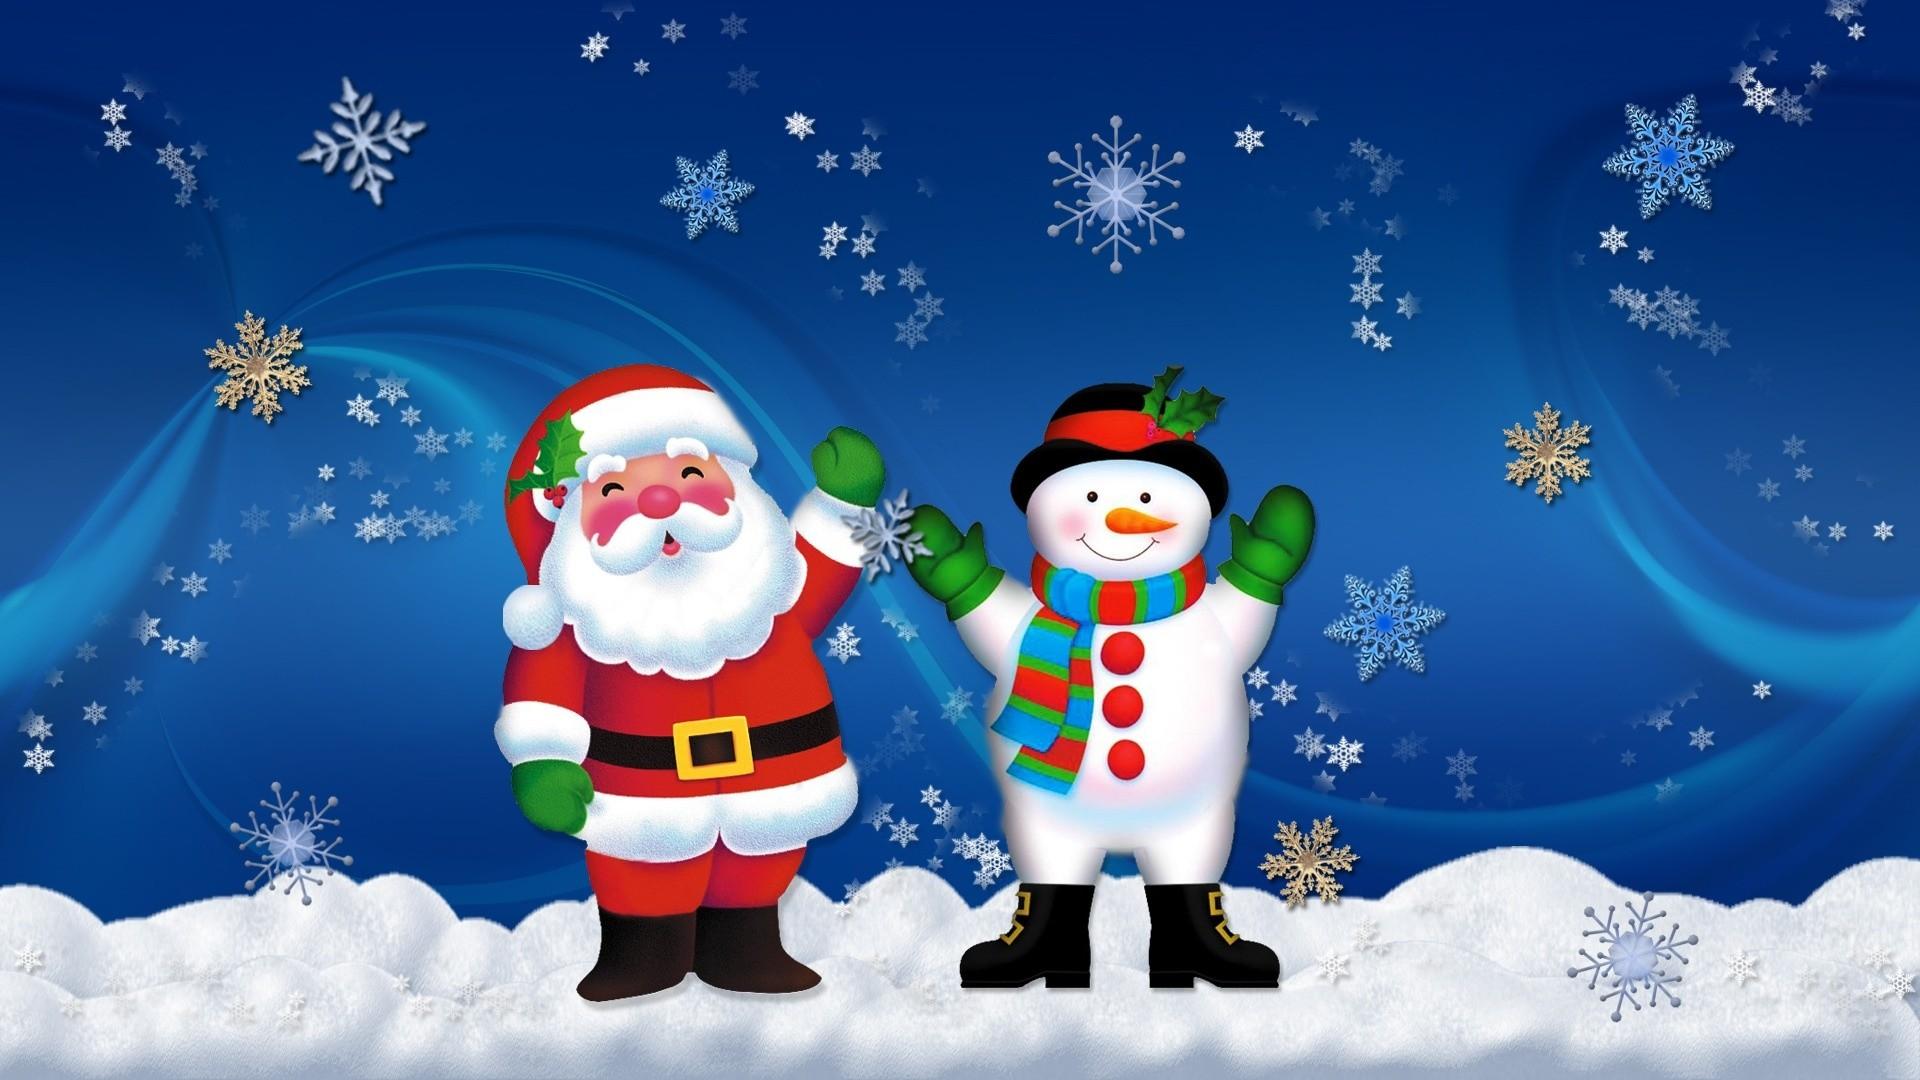 Screensavers   Free Christmas Screensavers for Mac & Vista   Desktop .